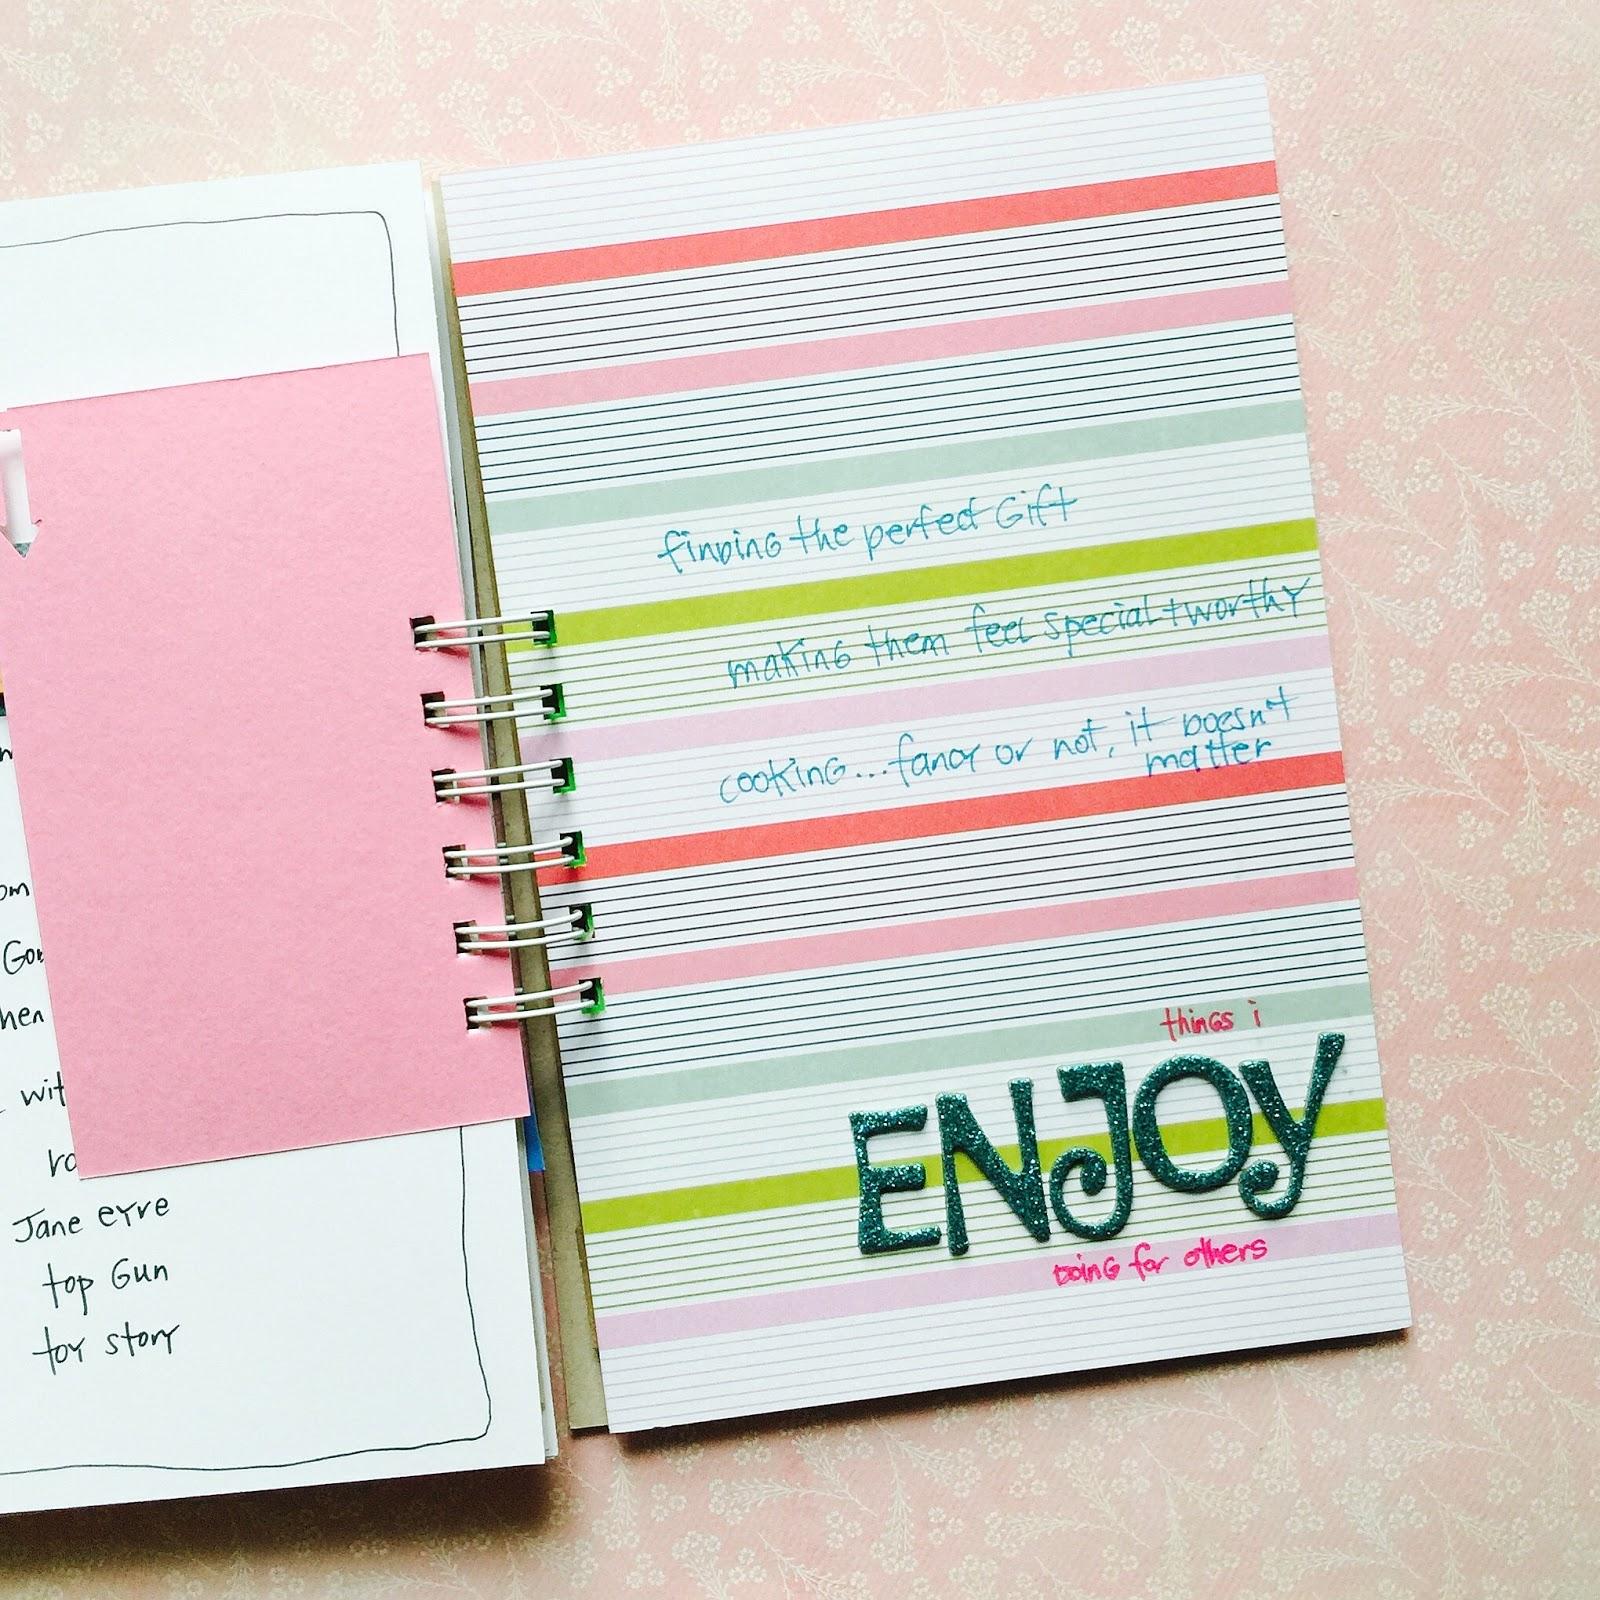 #smashbook #journal #scrapbook #minibook #pl #project life